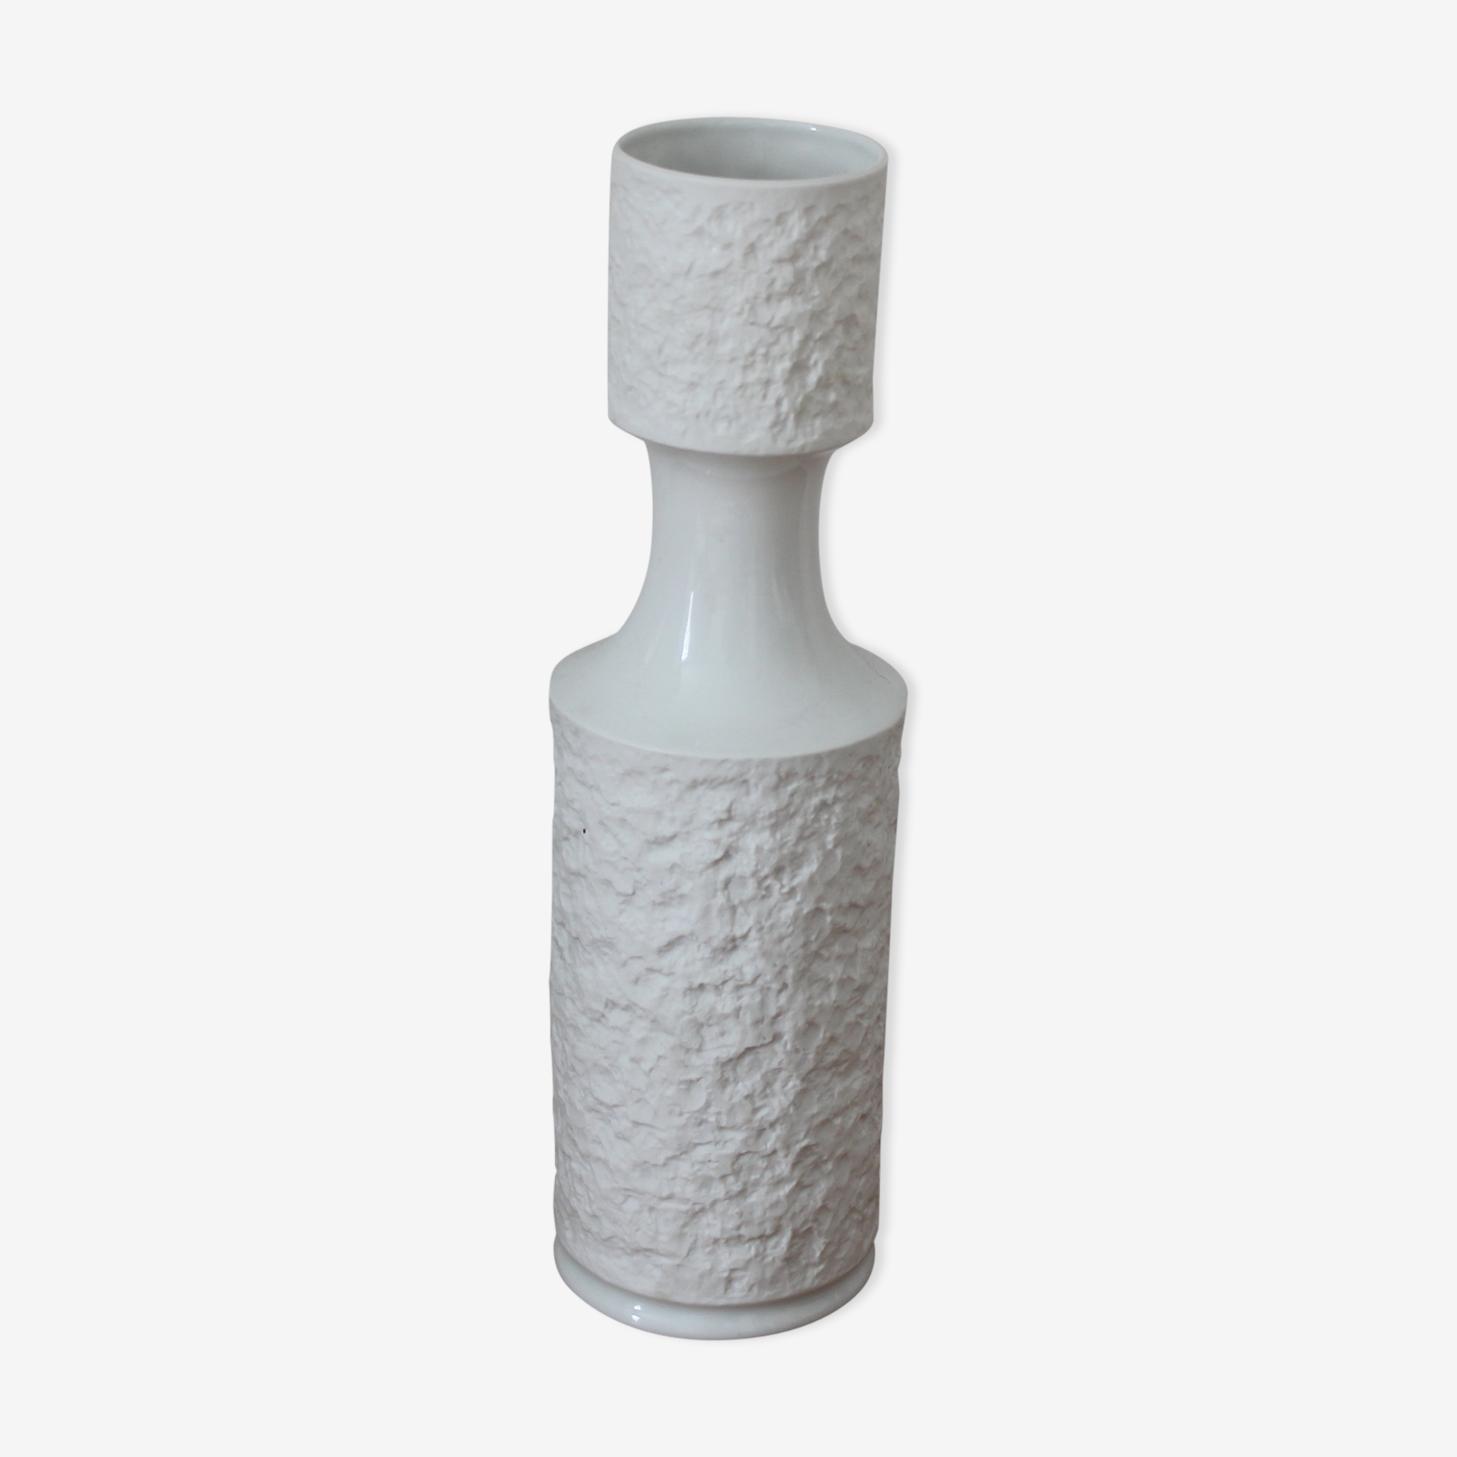 Vase en céramique kpm berlin